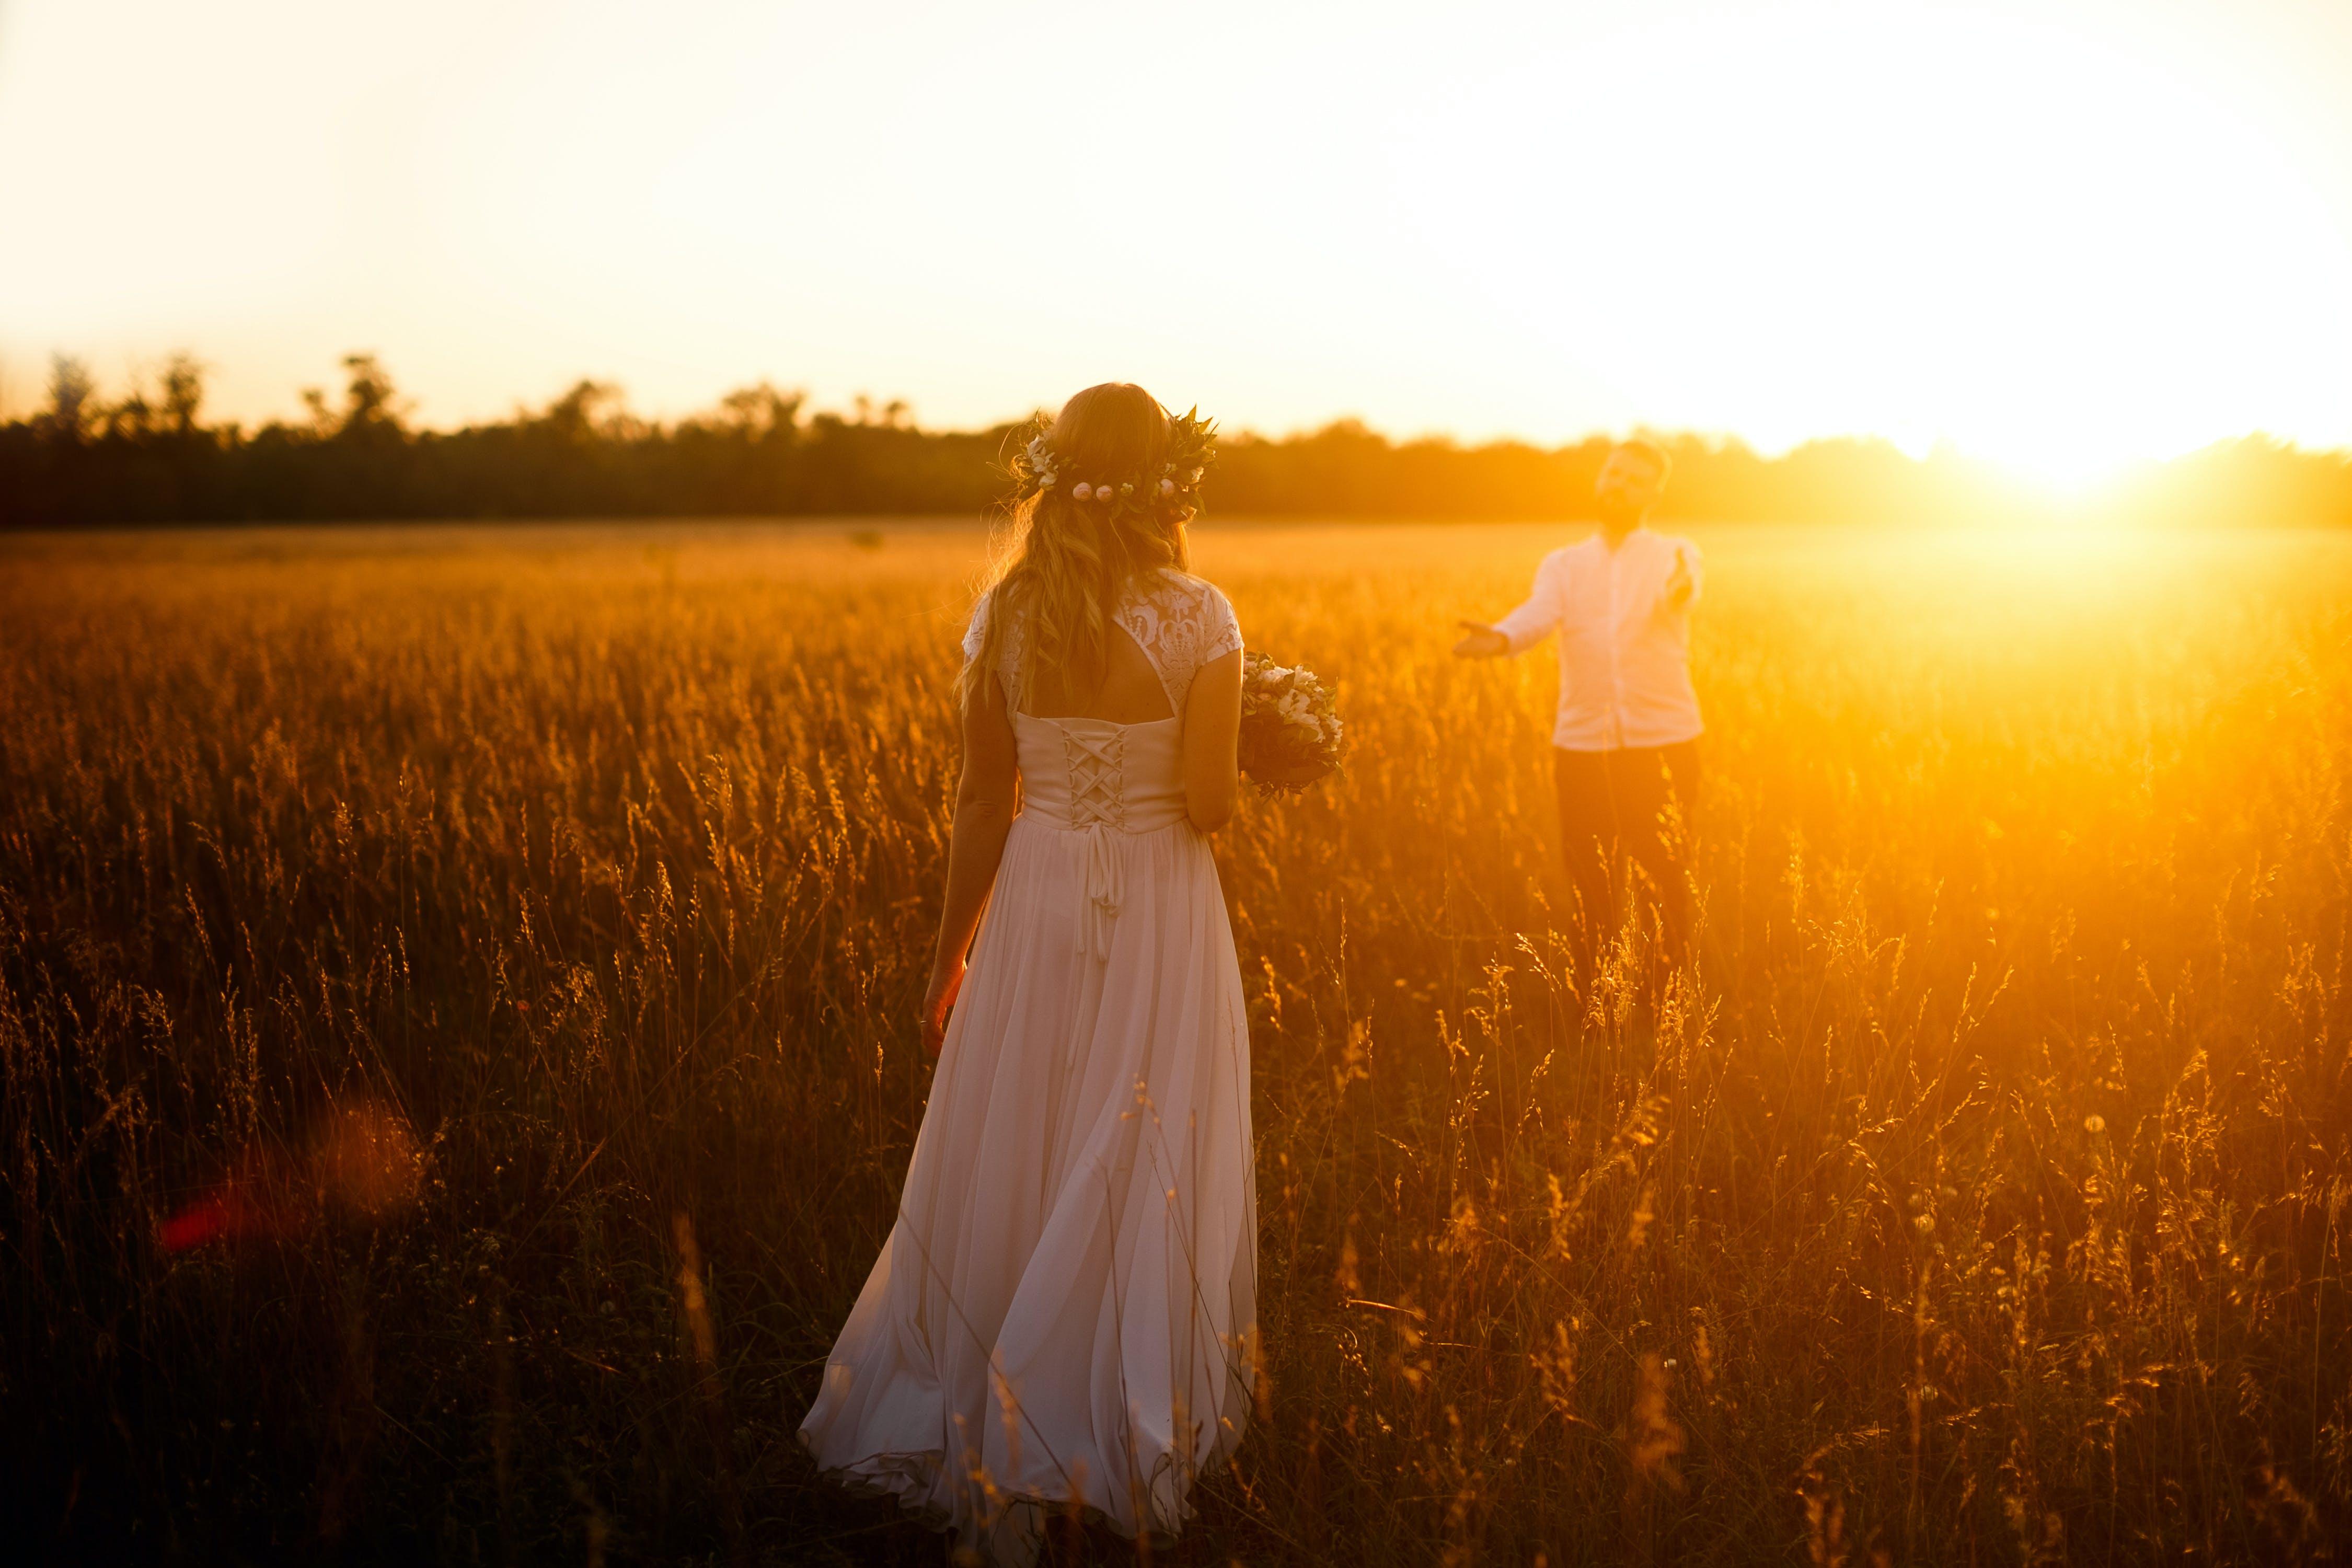 Gratis stockfoto met bruid, dageraad, gras, jurk